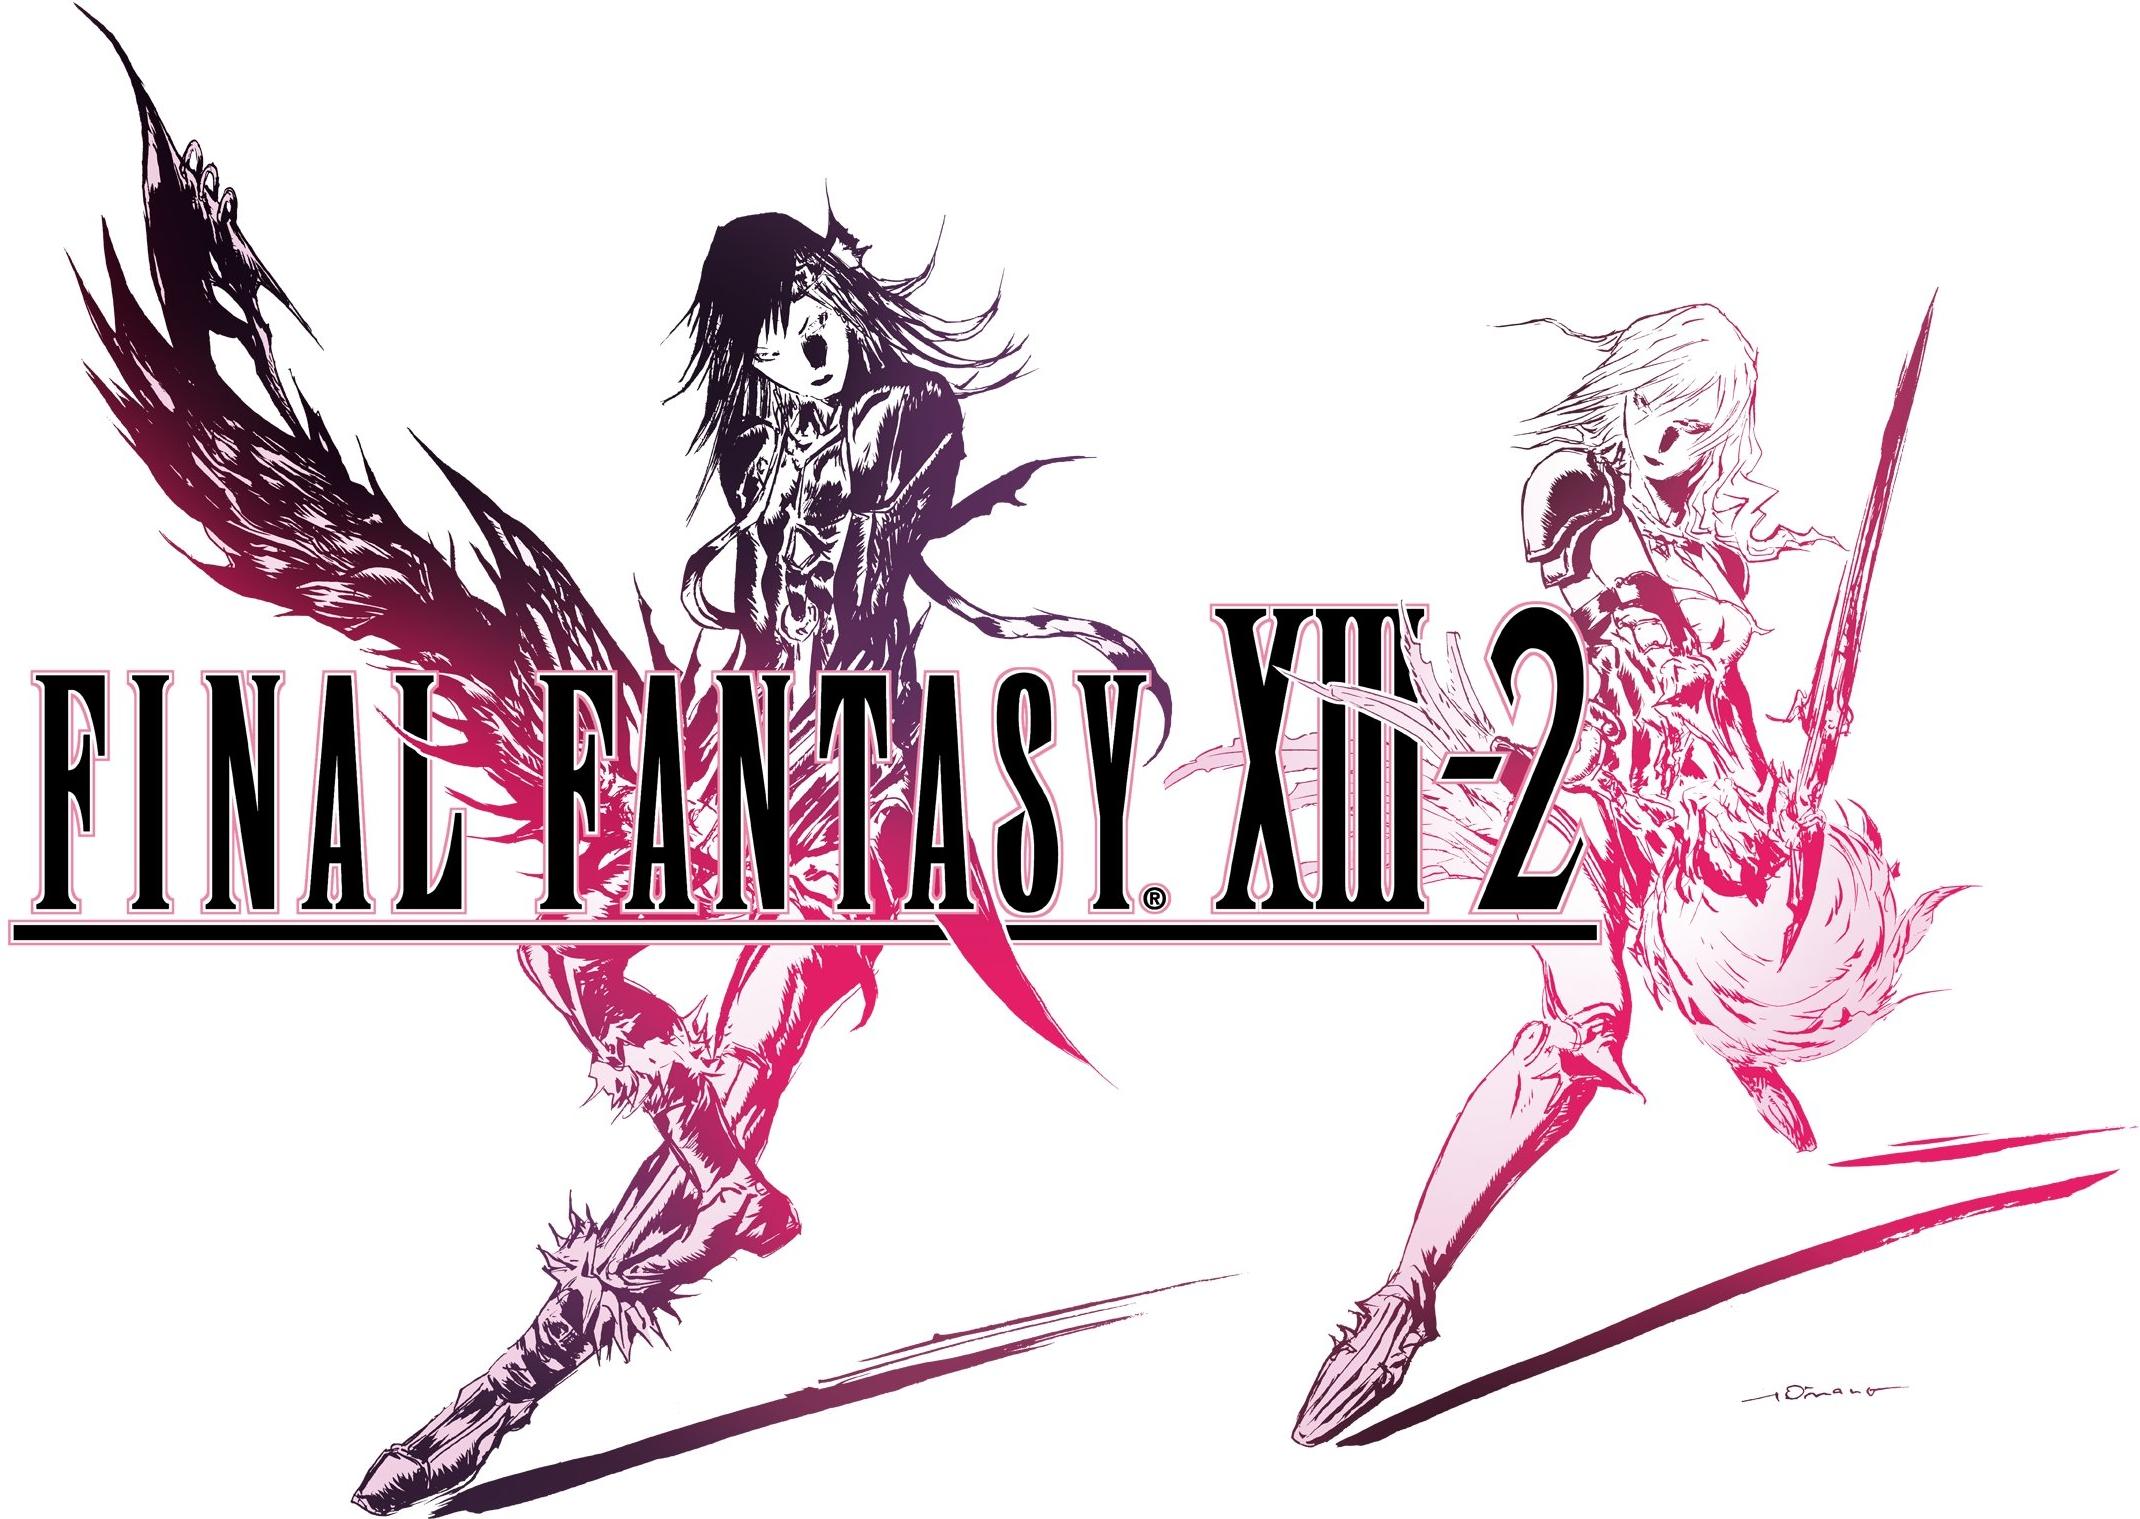 Arquivo:FinalFantasy XIII-2 Logo.png